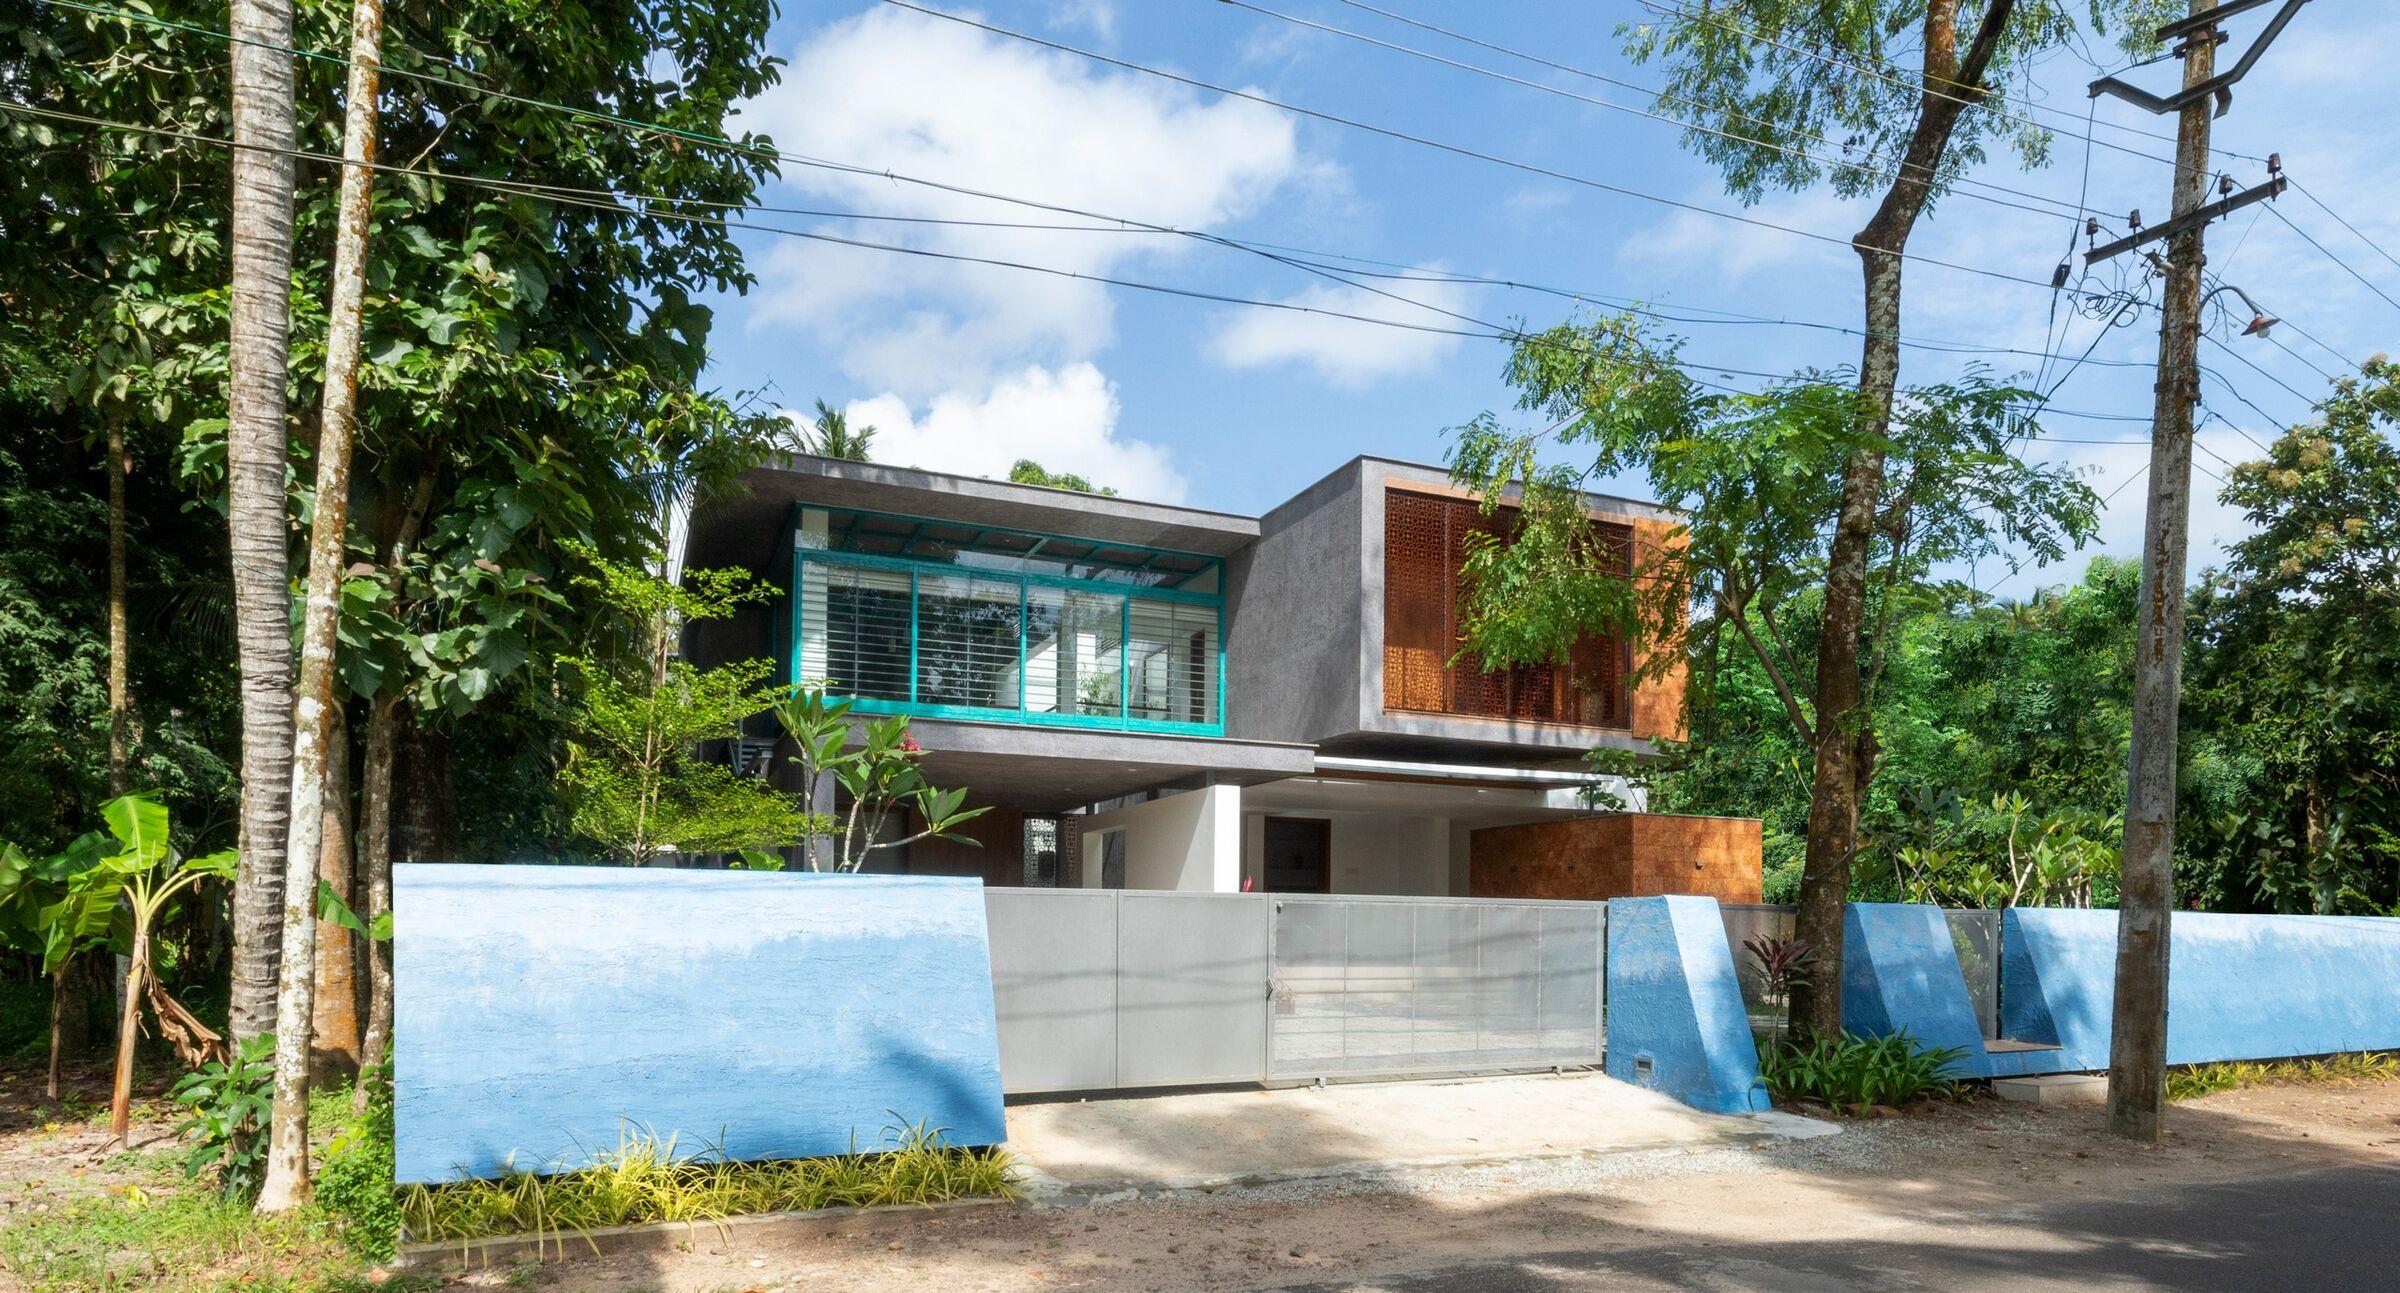 Manjadi House Of The Bead Tree No Architects Designers And Social Artists Medios De Comunicacion Fotos Y Videos 1 Archello